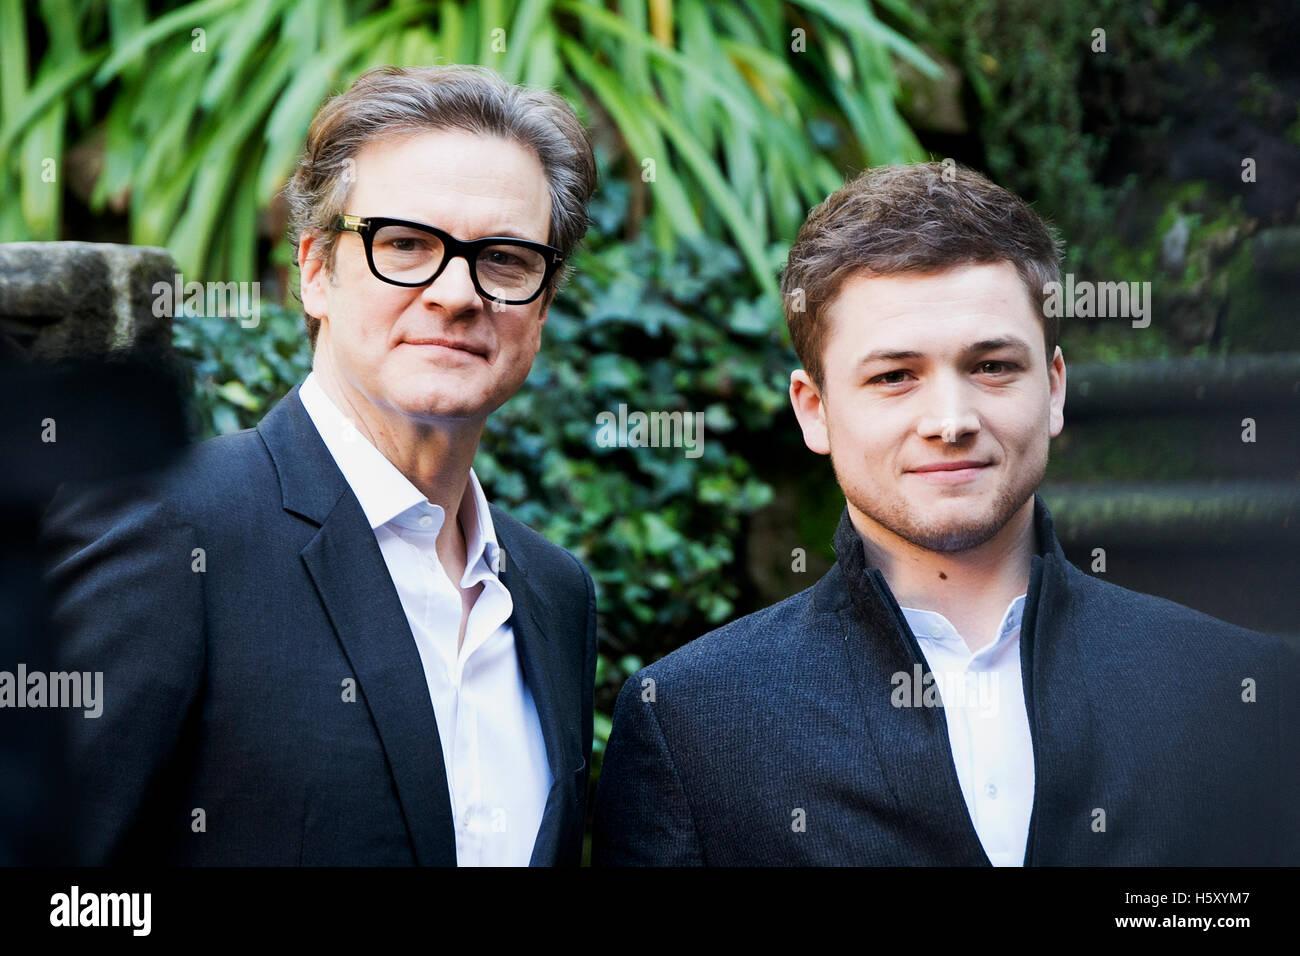 Colin Firth und Taron Egerton während der Fototermin Kingsman in Rom Stockbild